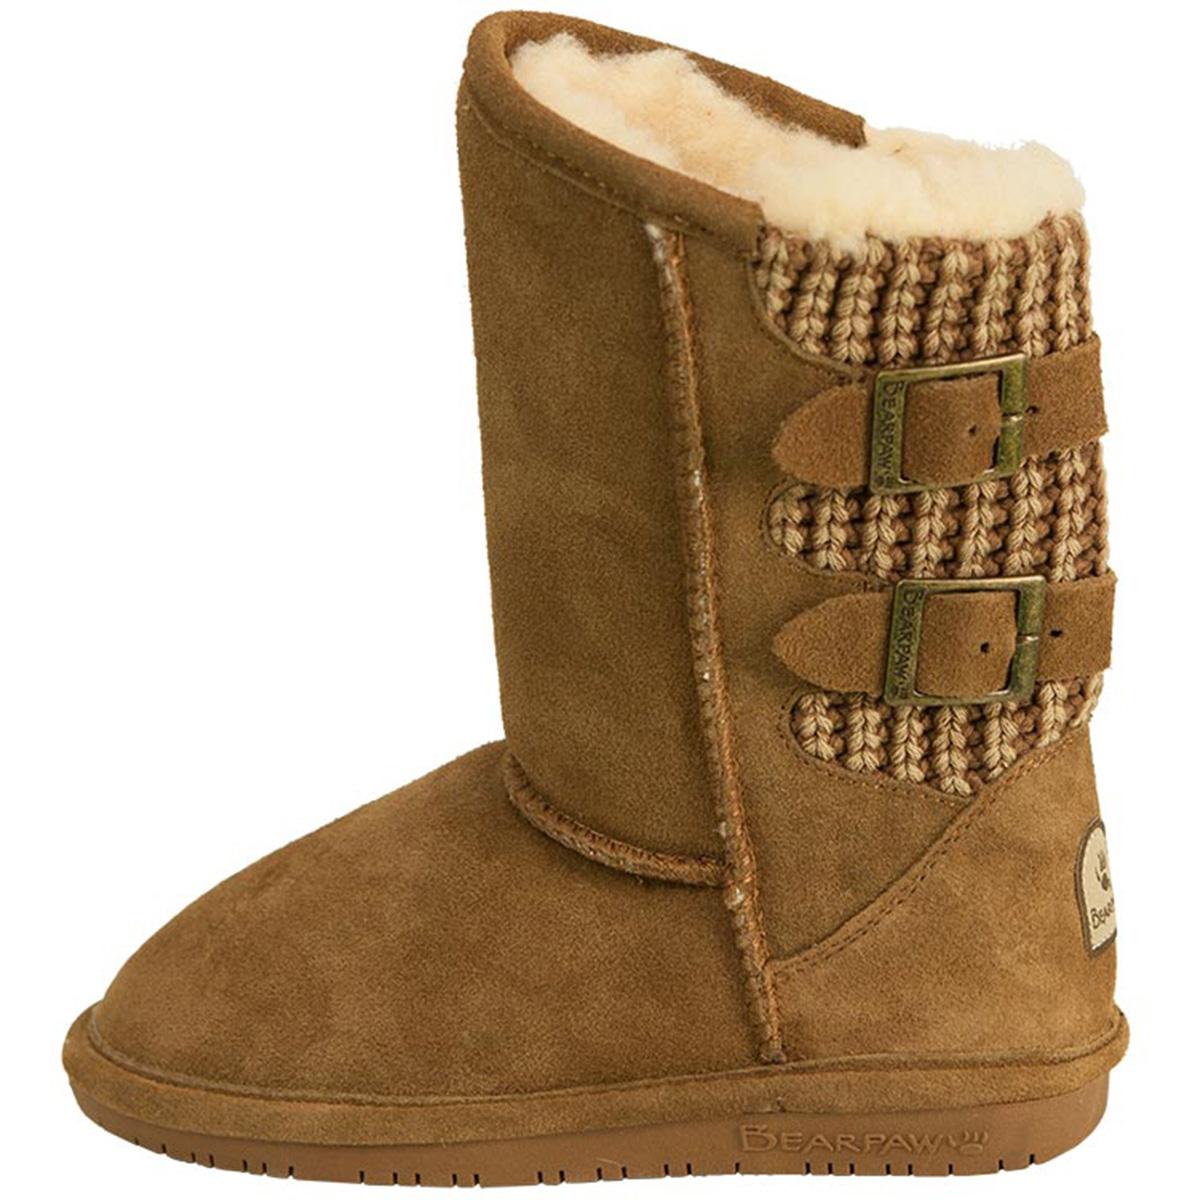 BEARPAW Girls' Boshie Boots - Bob's Stores